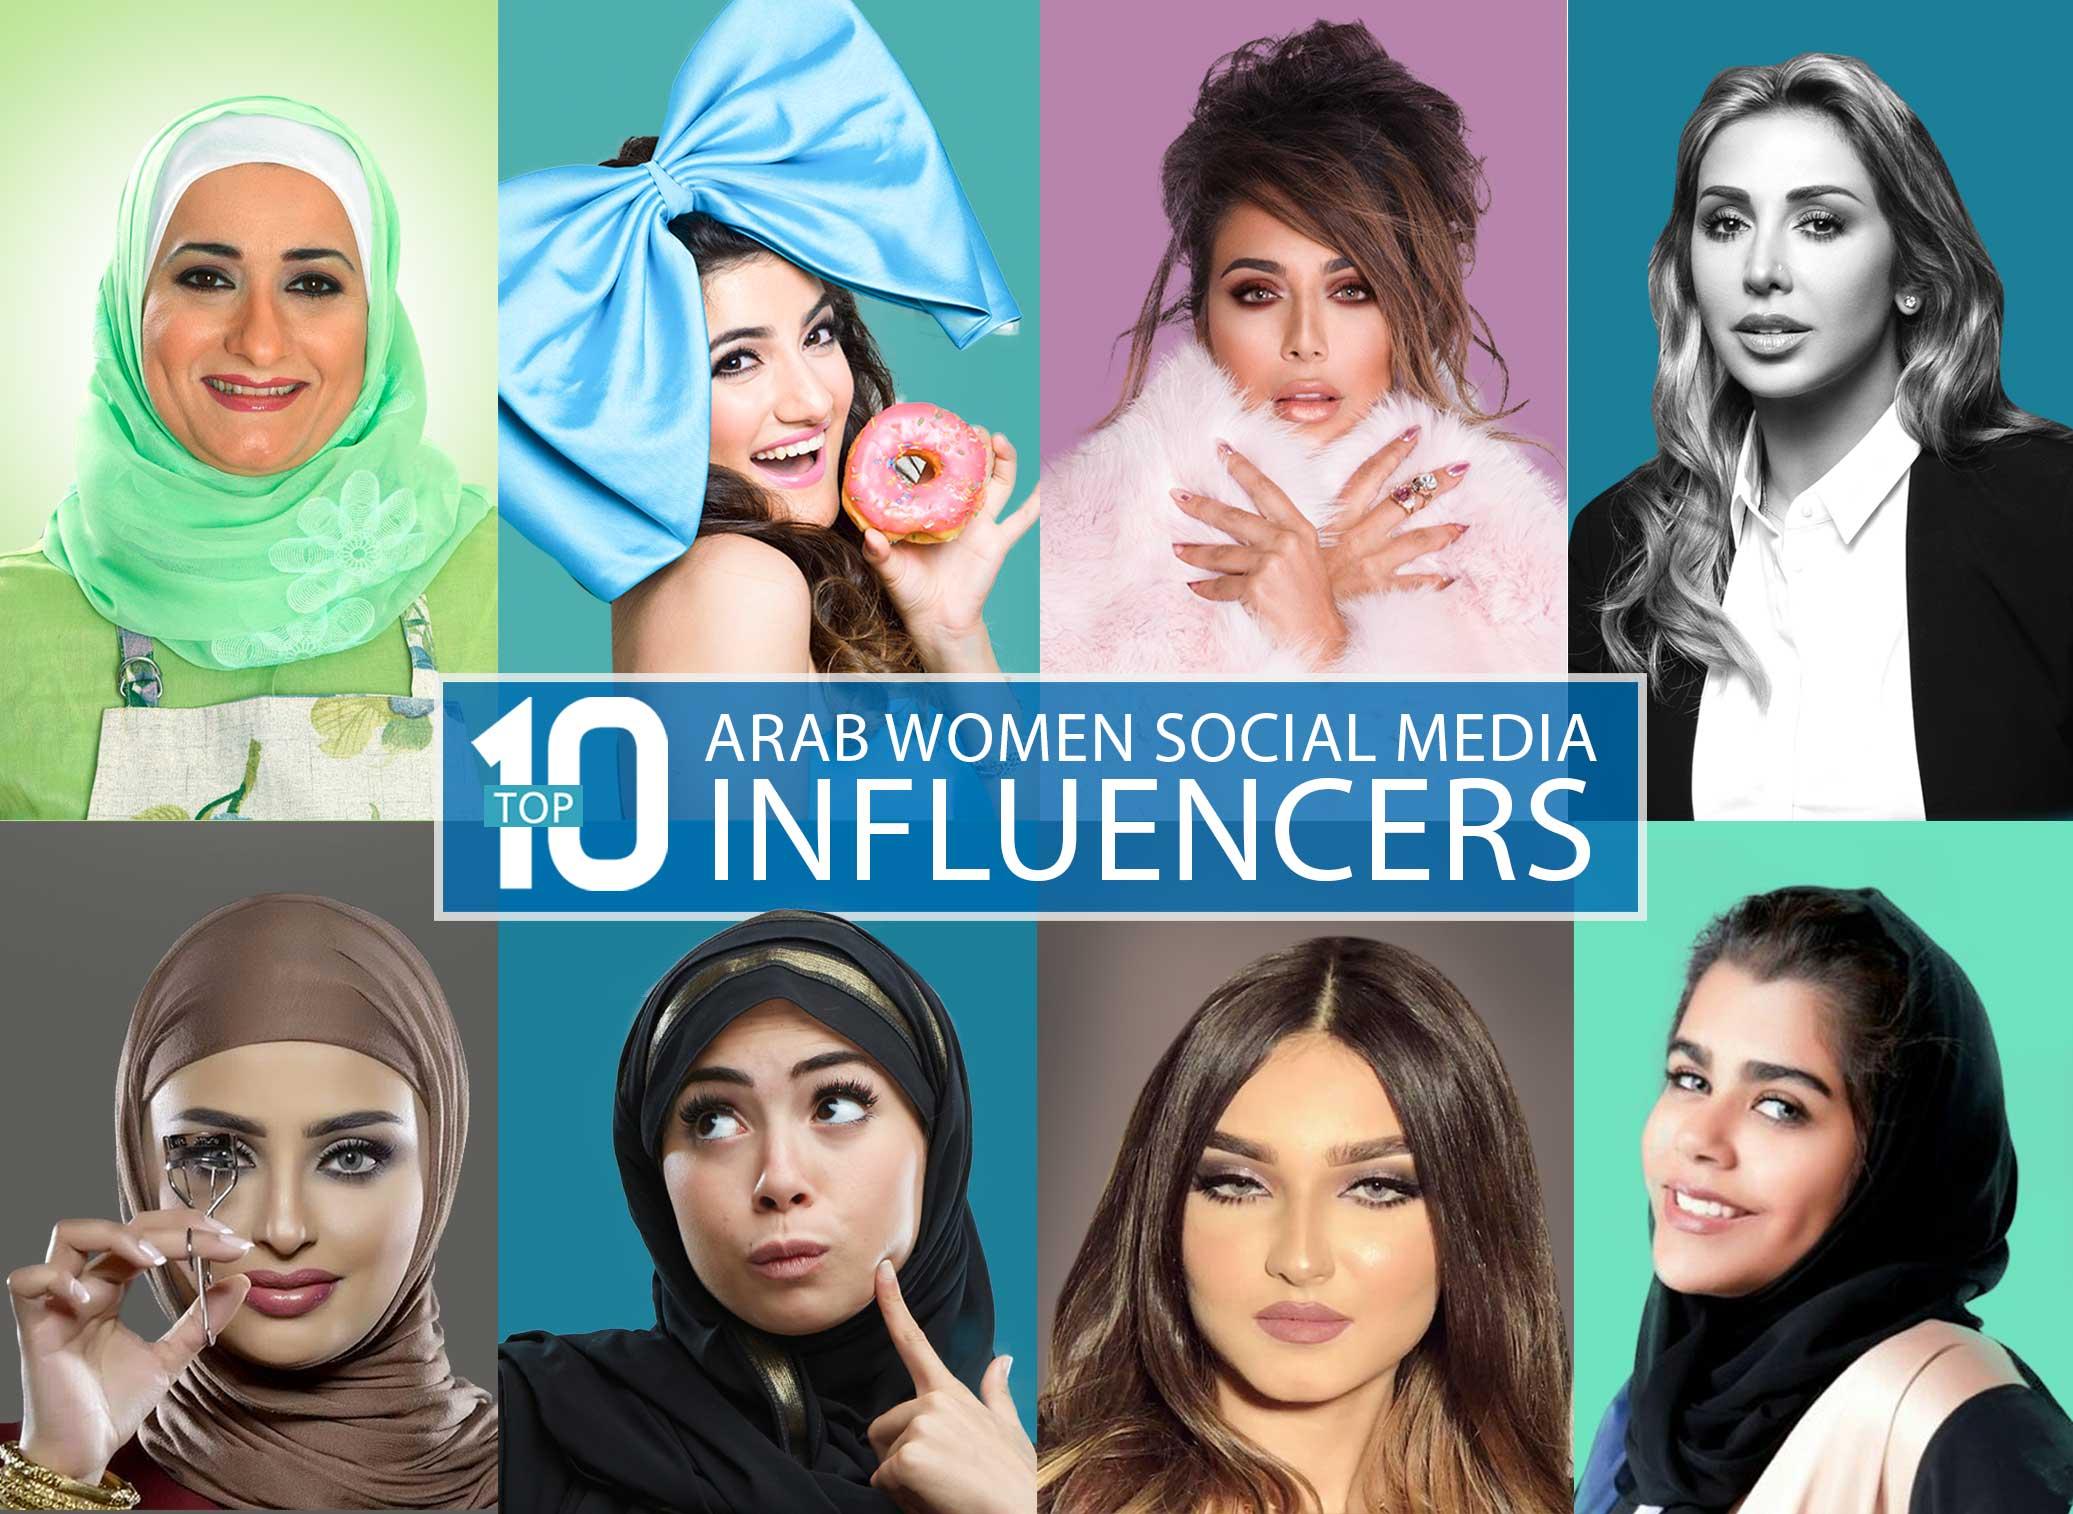 The Top 10 Arab Women Social Media Influencers